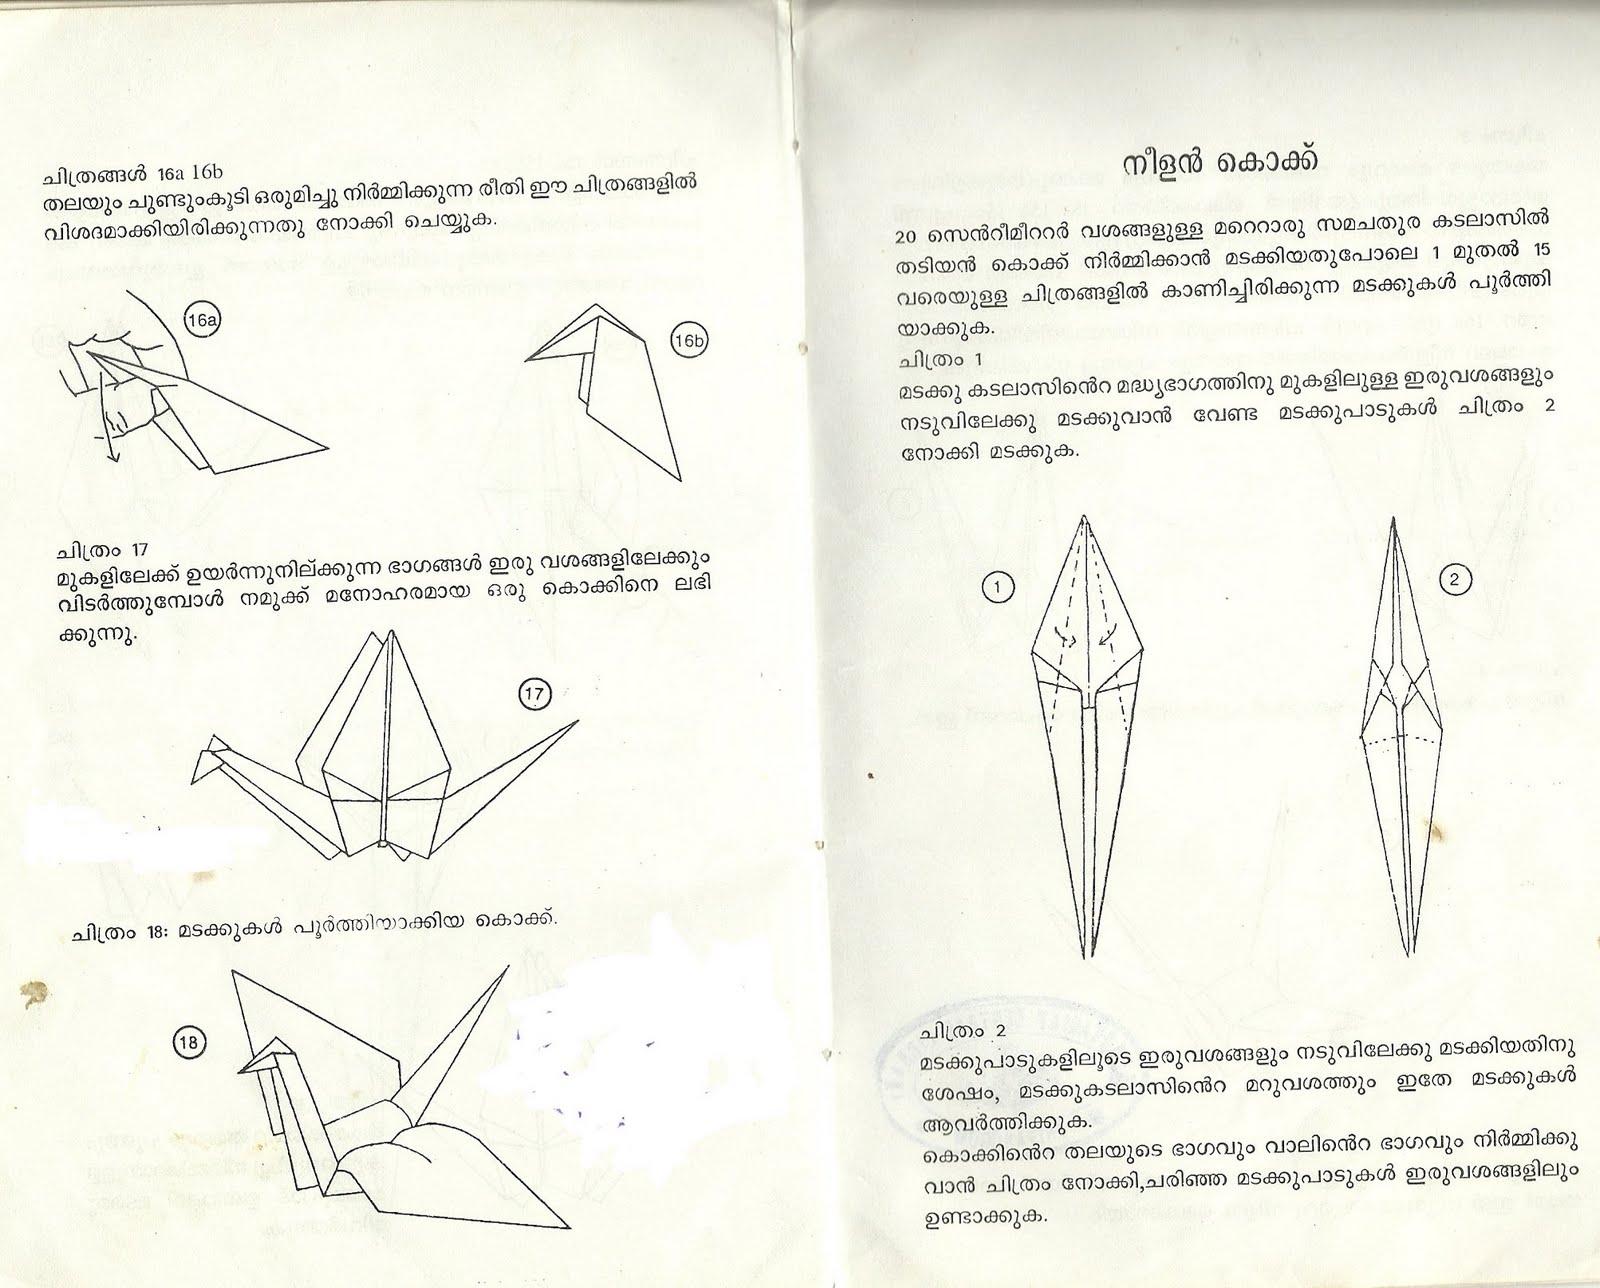 Kerala Psc Tips Sadako And The Thousand Paper Cranes